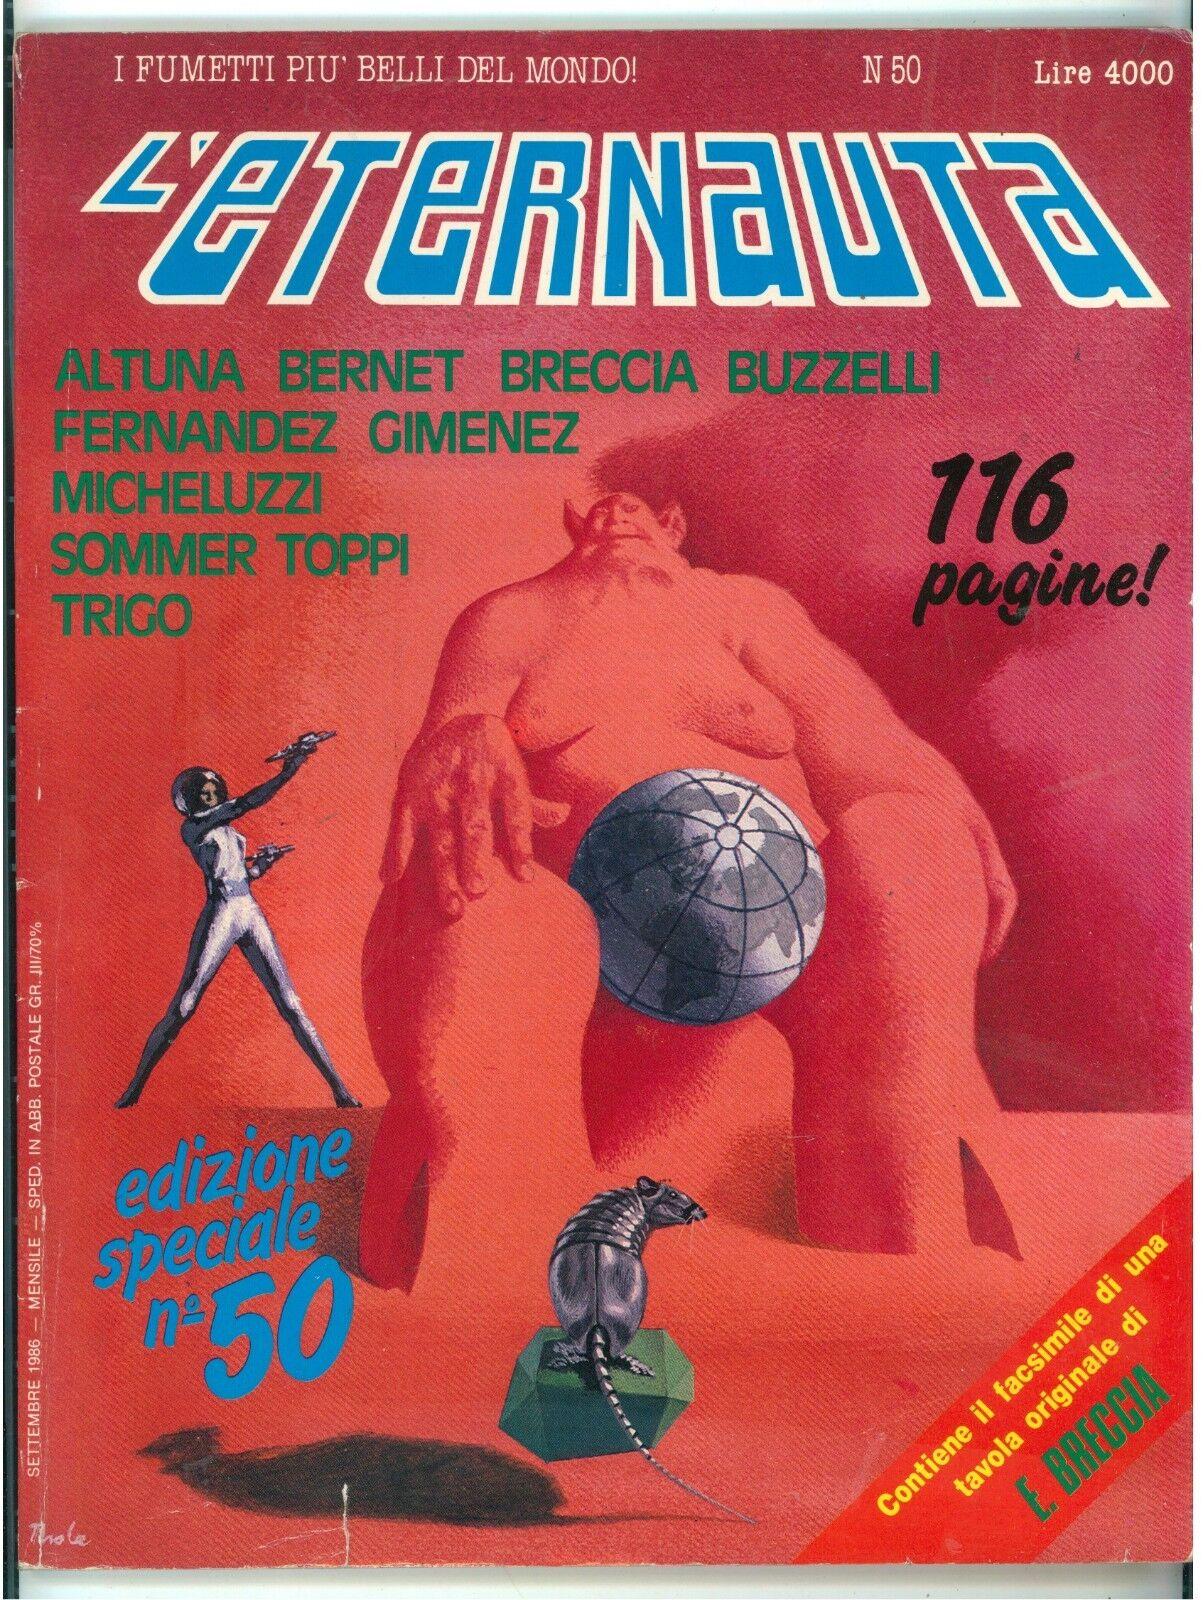 L'ETERNAUTA NUMERO 50 SETTEMBRE 1986 FUMETTI KARL THOLE SERGIO TOPPI FERNANDEZ